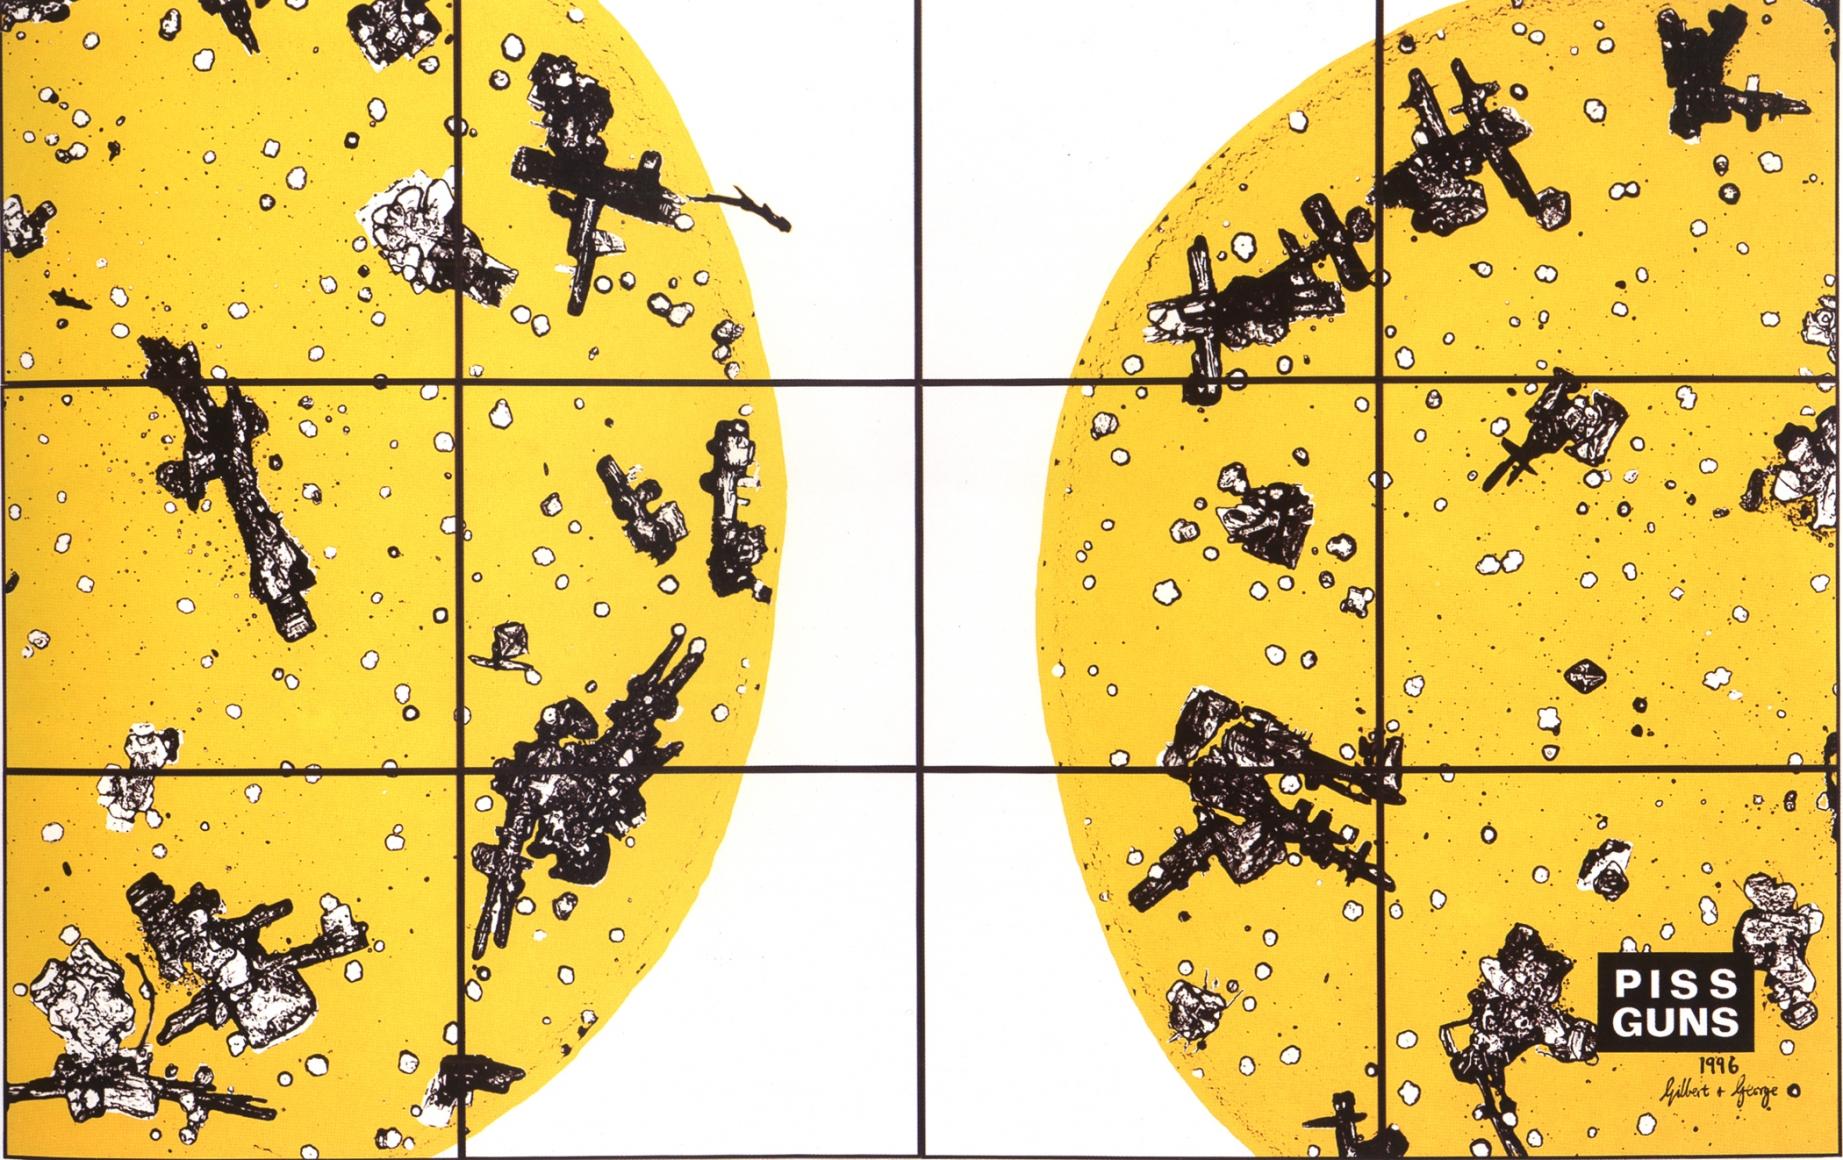 比利·æŸ¥çˆ¾è¿ªæ–¯ Piss Guns, 1996